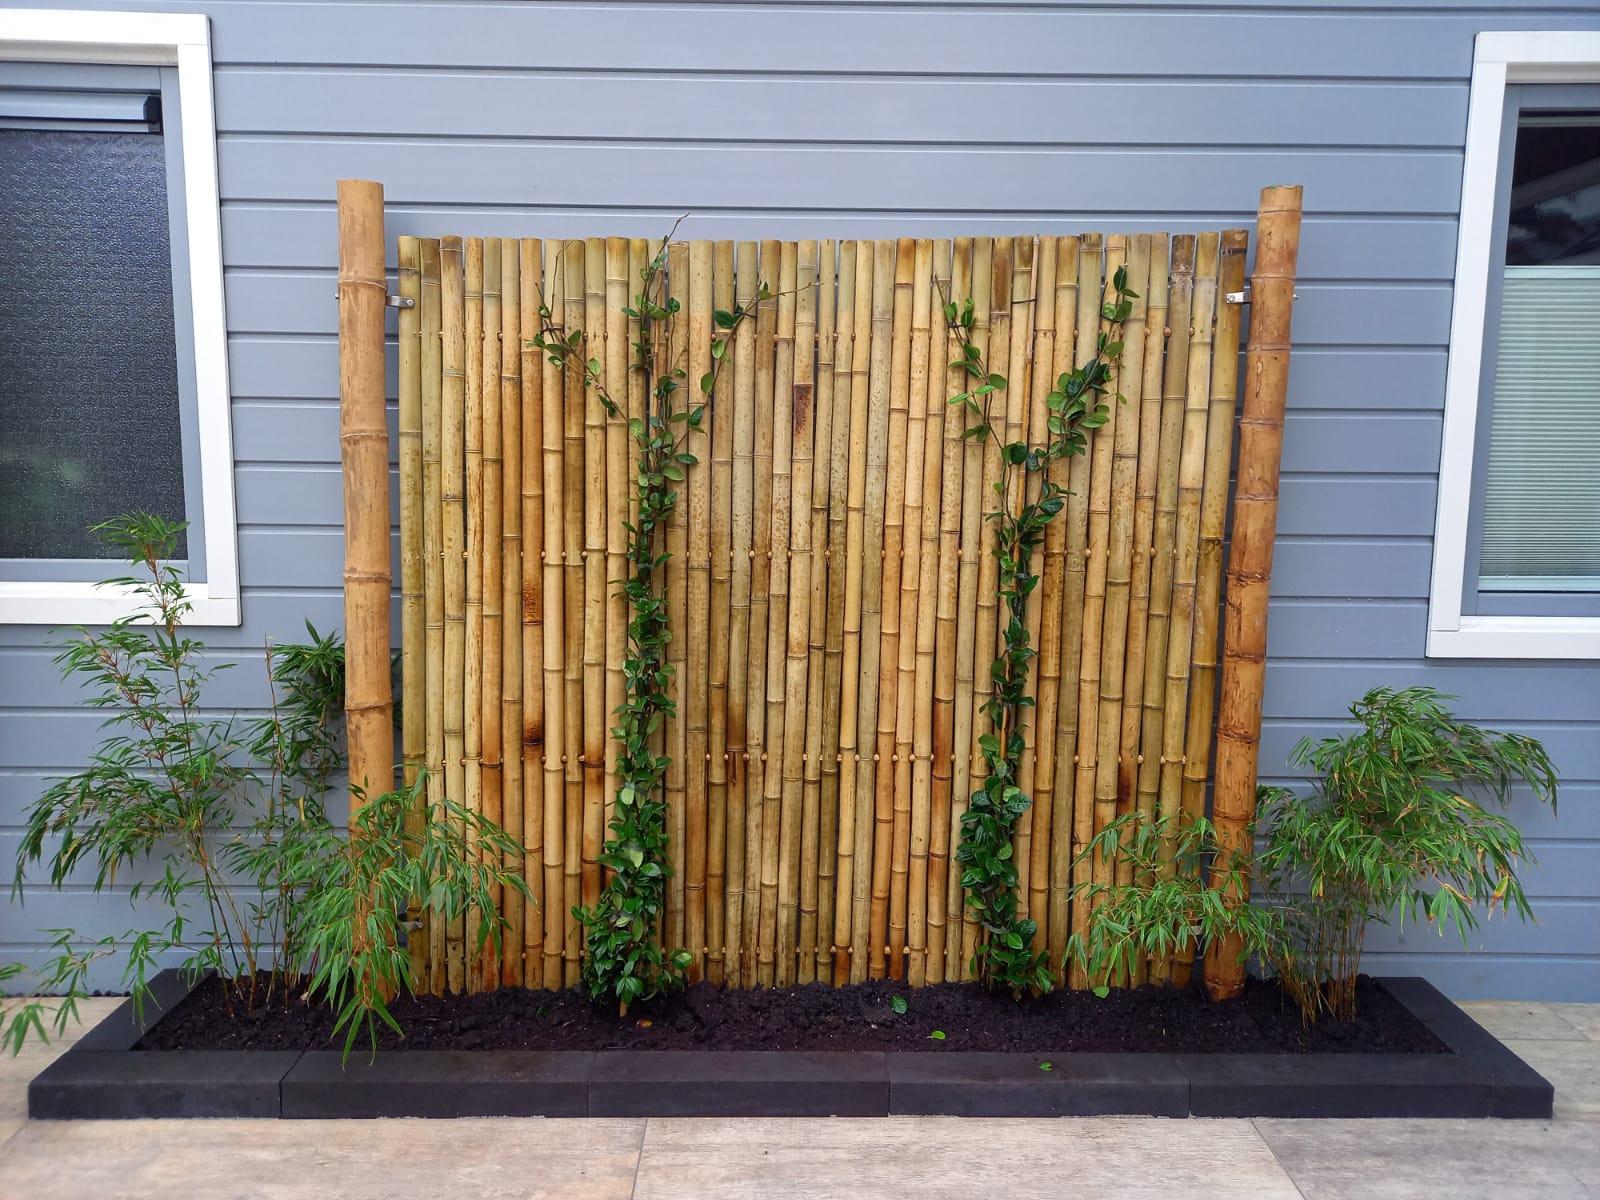 Tuinaanleg bamboe schutting Haarlem